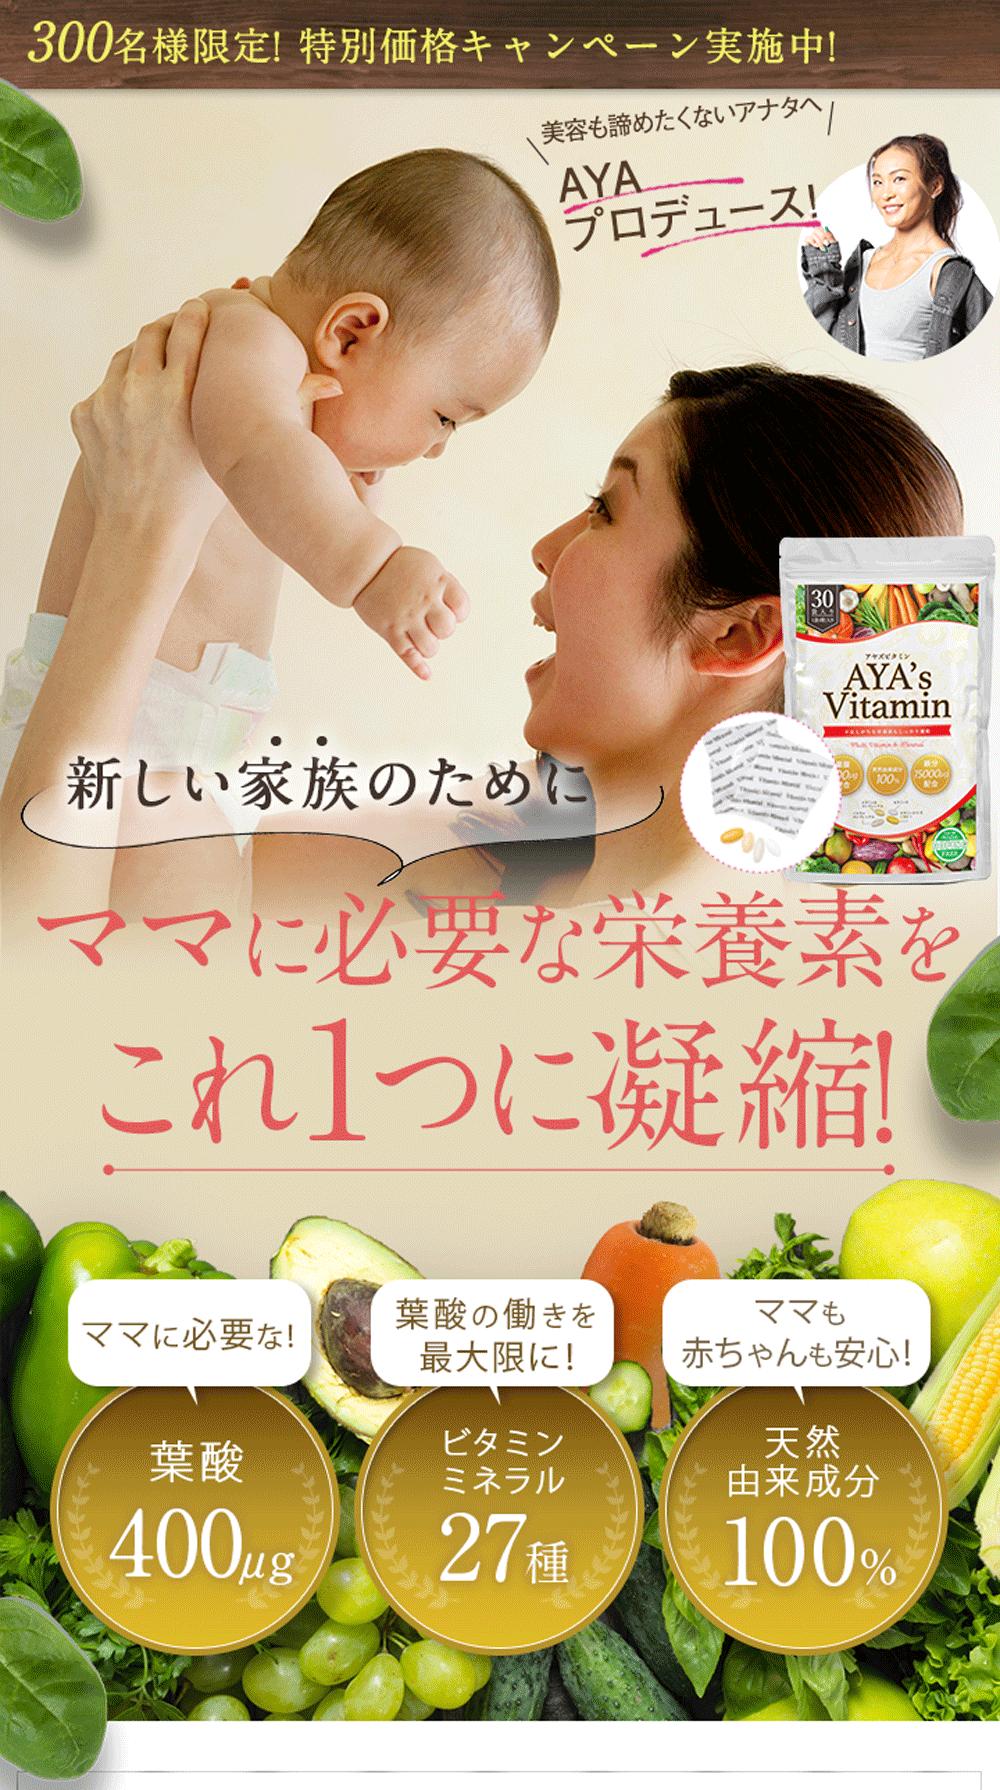 AYA監修のサプリメント。ママに必要な栄養素をこれ1つに凝縮